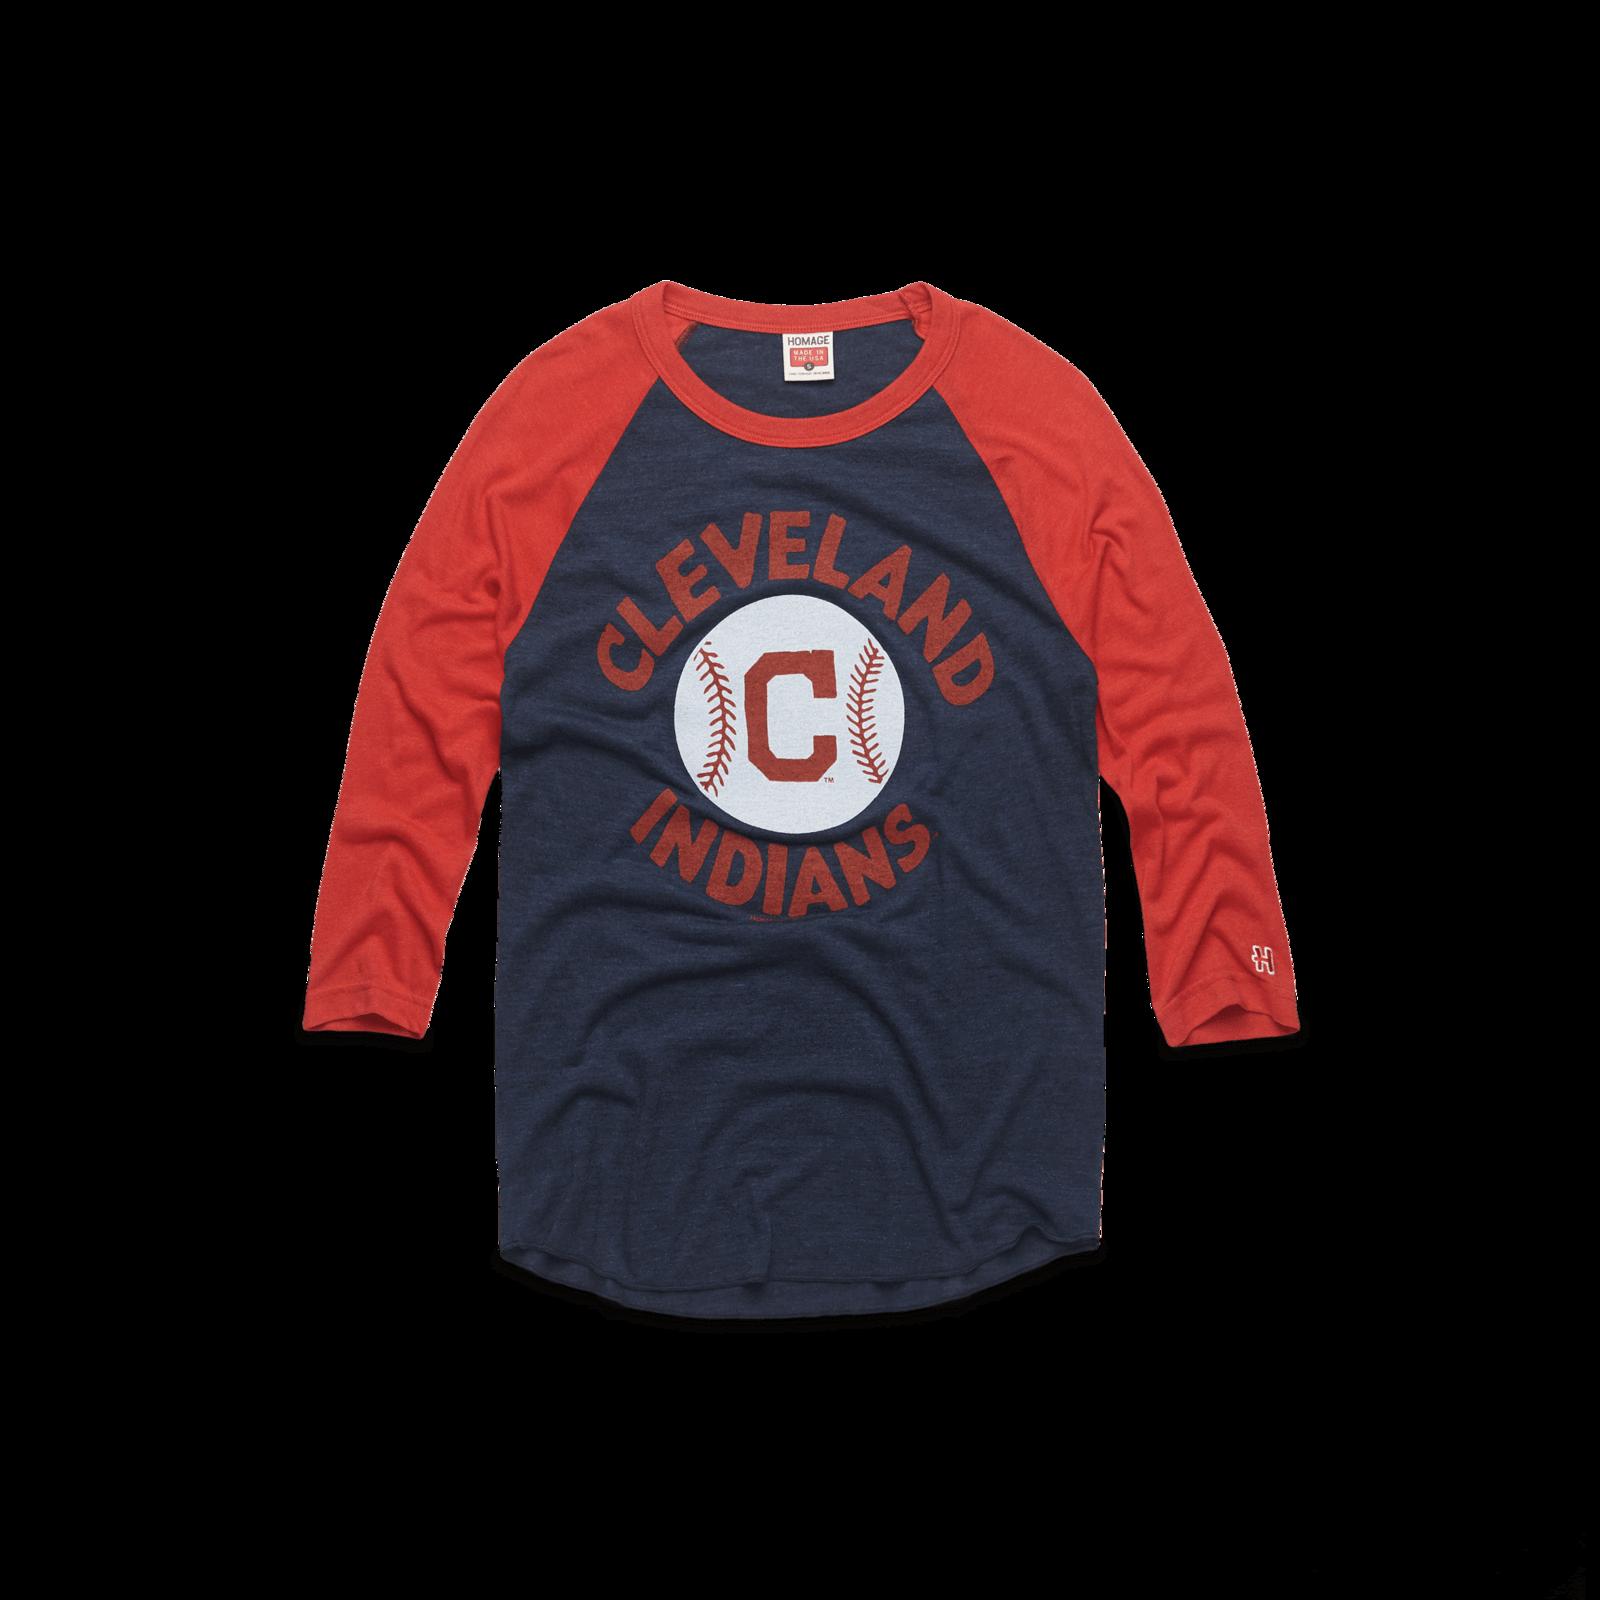 61c9aed3 Cleveland Indians Baseball, Baseball Uniforms, Baseball Gifts, Hot Dogs,  Mlb, Sweatshirts